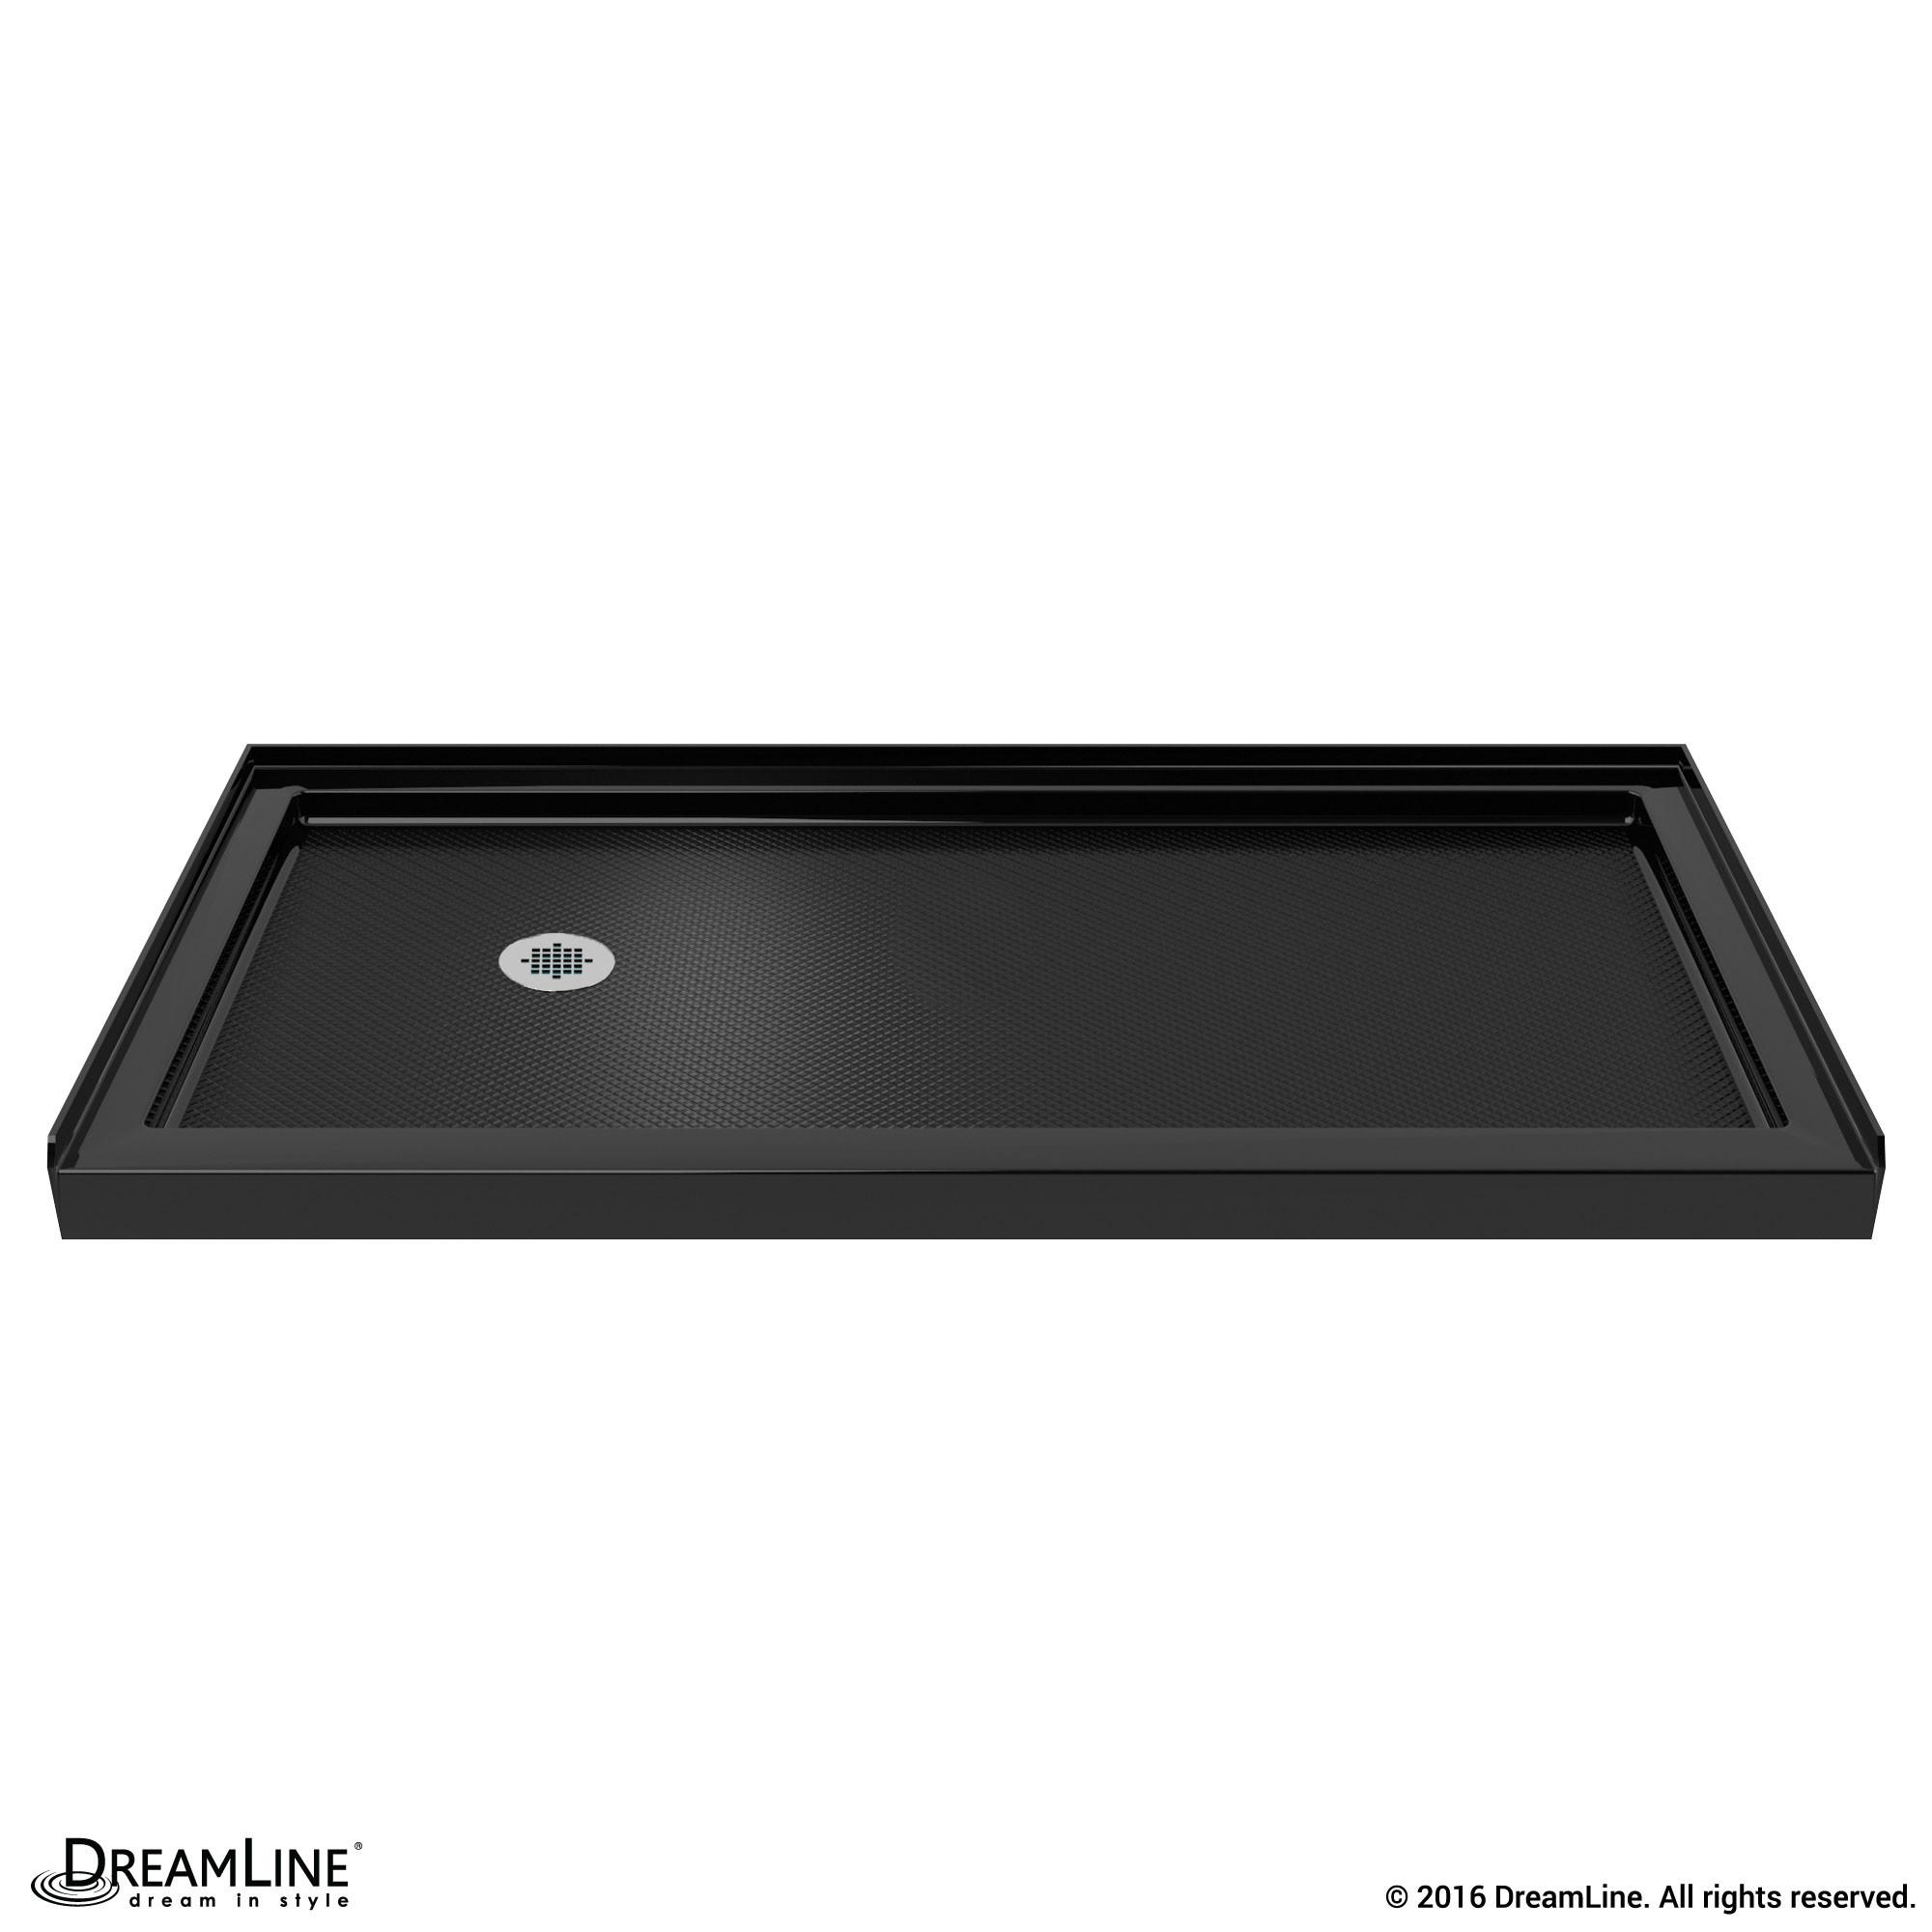 DreamLine DLT-1134601-88 SlimLine 34 Inch by 60 Inch Single Threshold Shower Base In Black Color Left Hand Drain